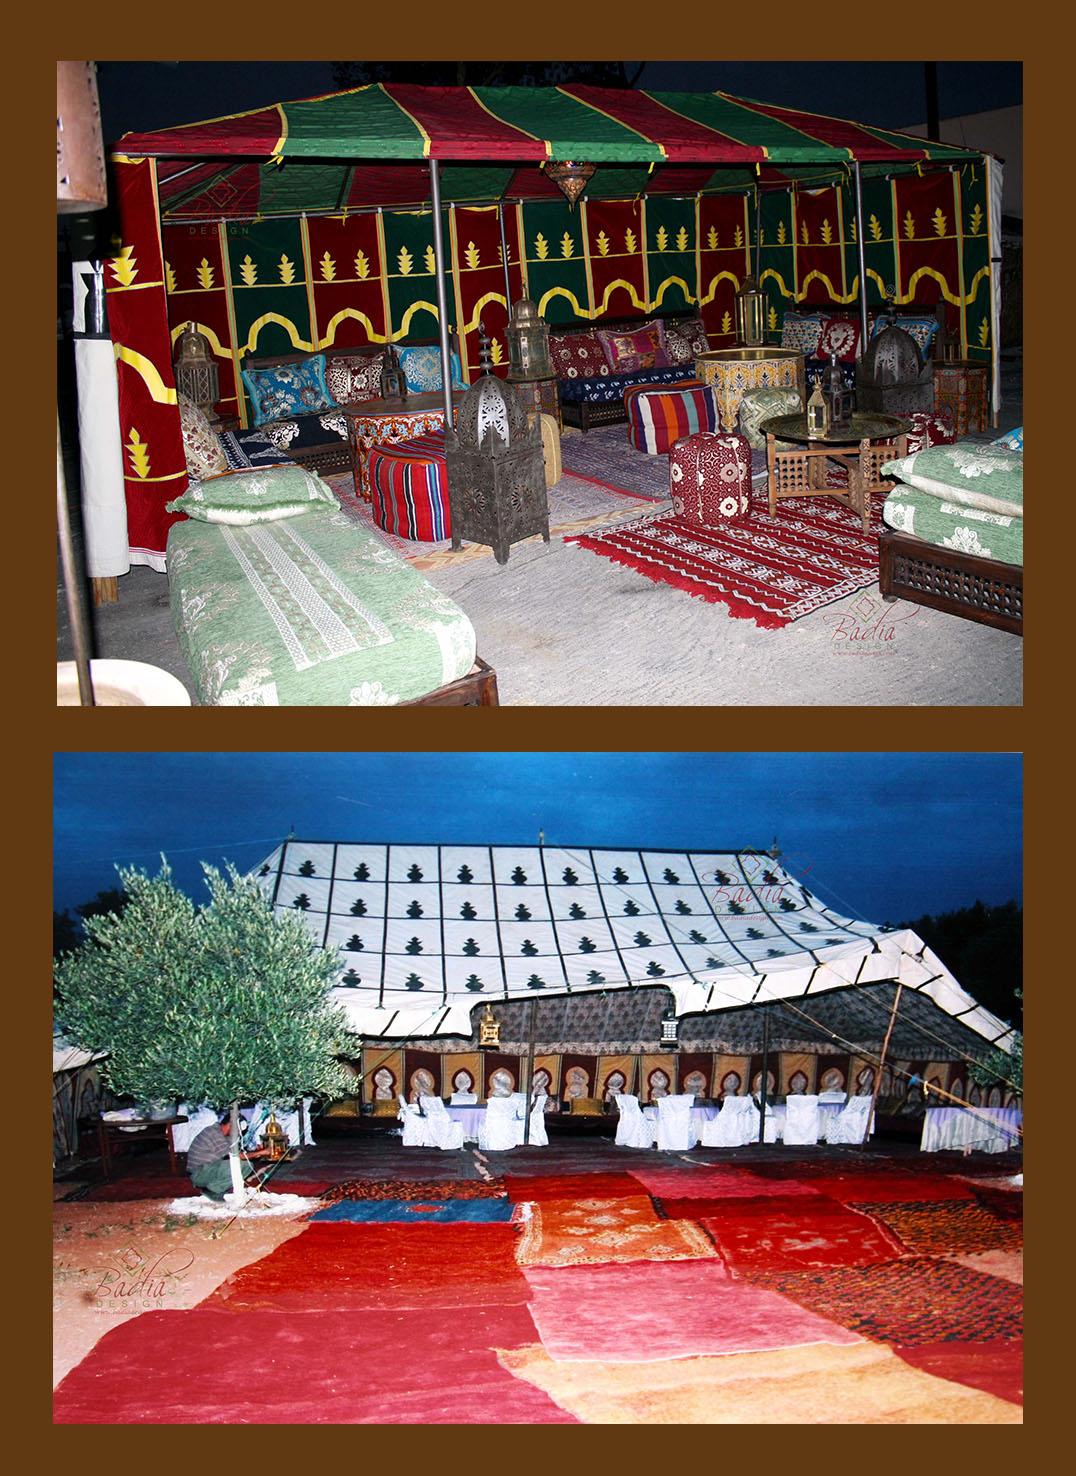 Arabian Nights Party Rental from Badia Design Inc.